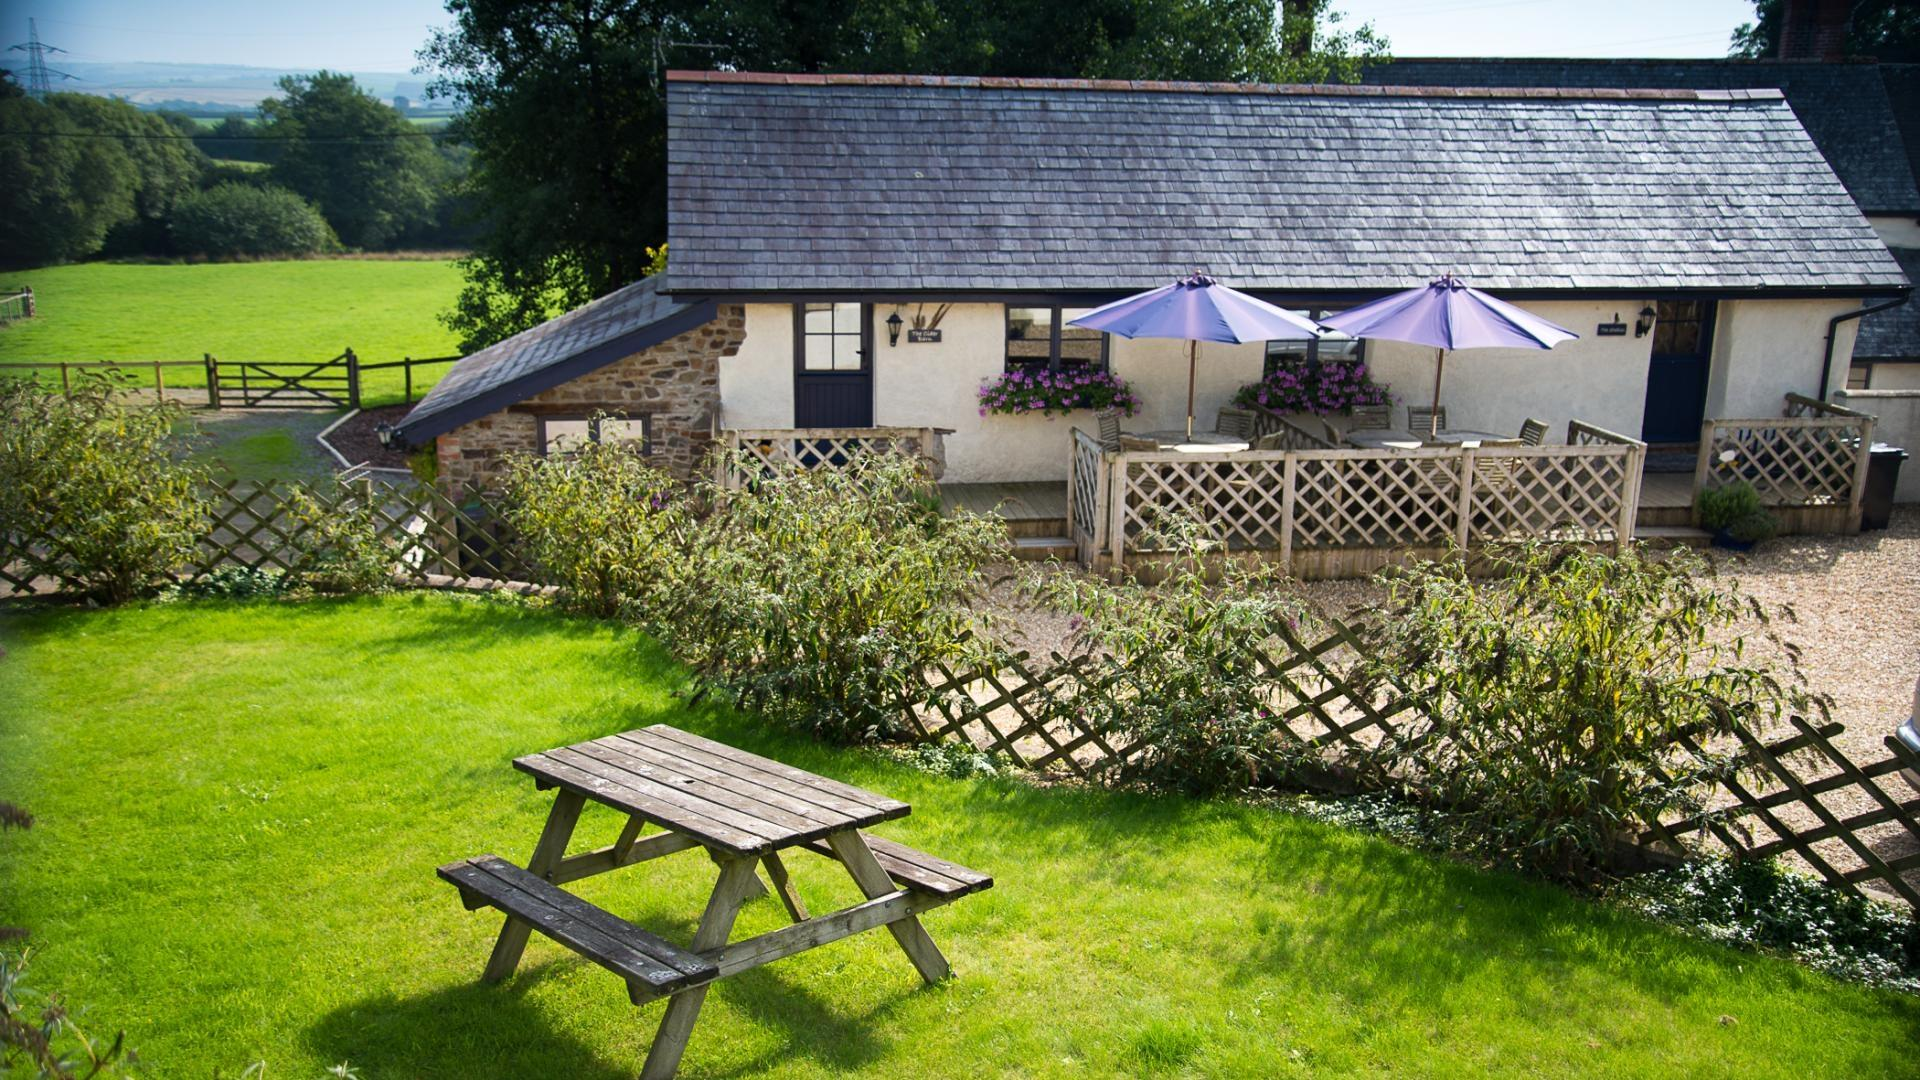 one bedroom baby-friendly holiday cottage in North Devon - TNBC